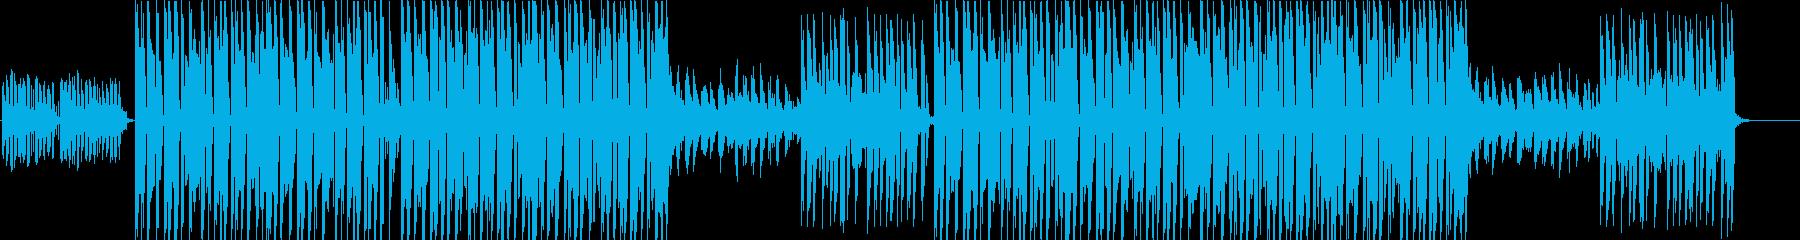 sugaercrashの様な可愛いビートの再生済みの波形